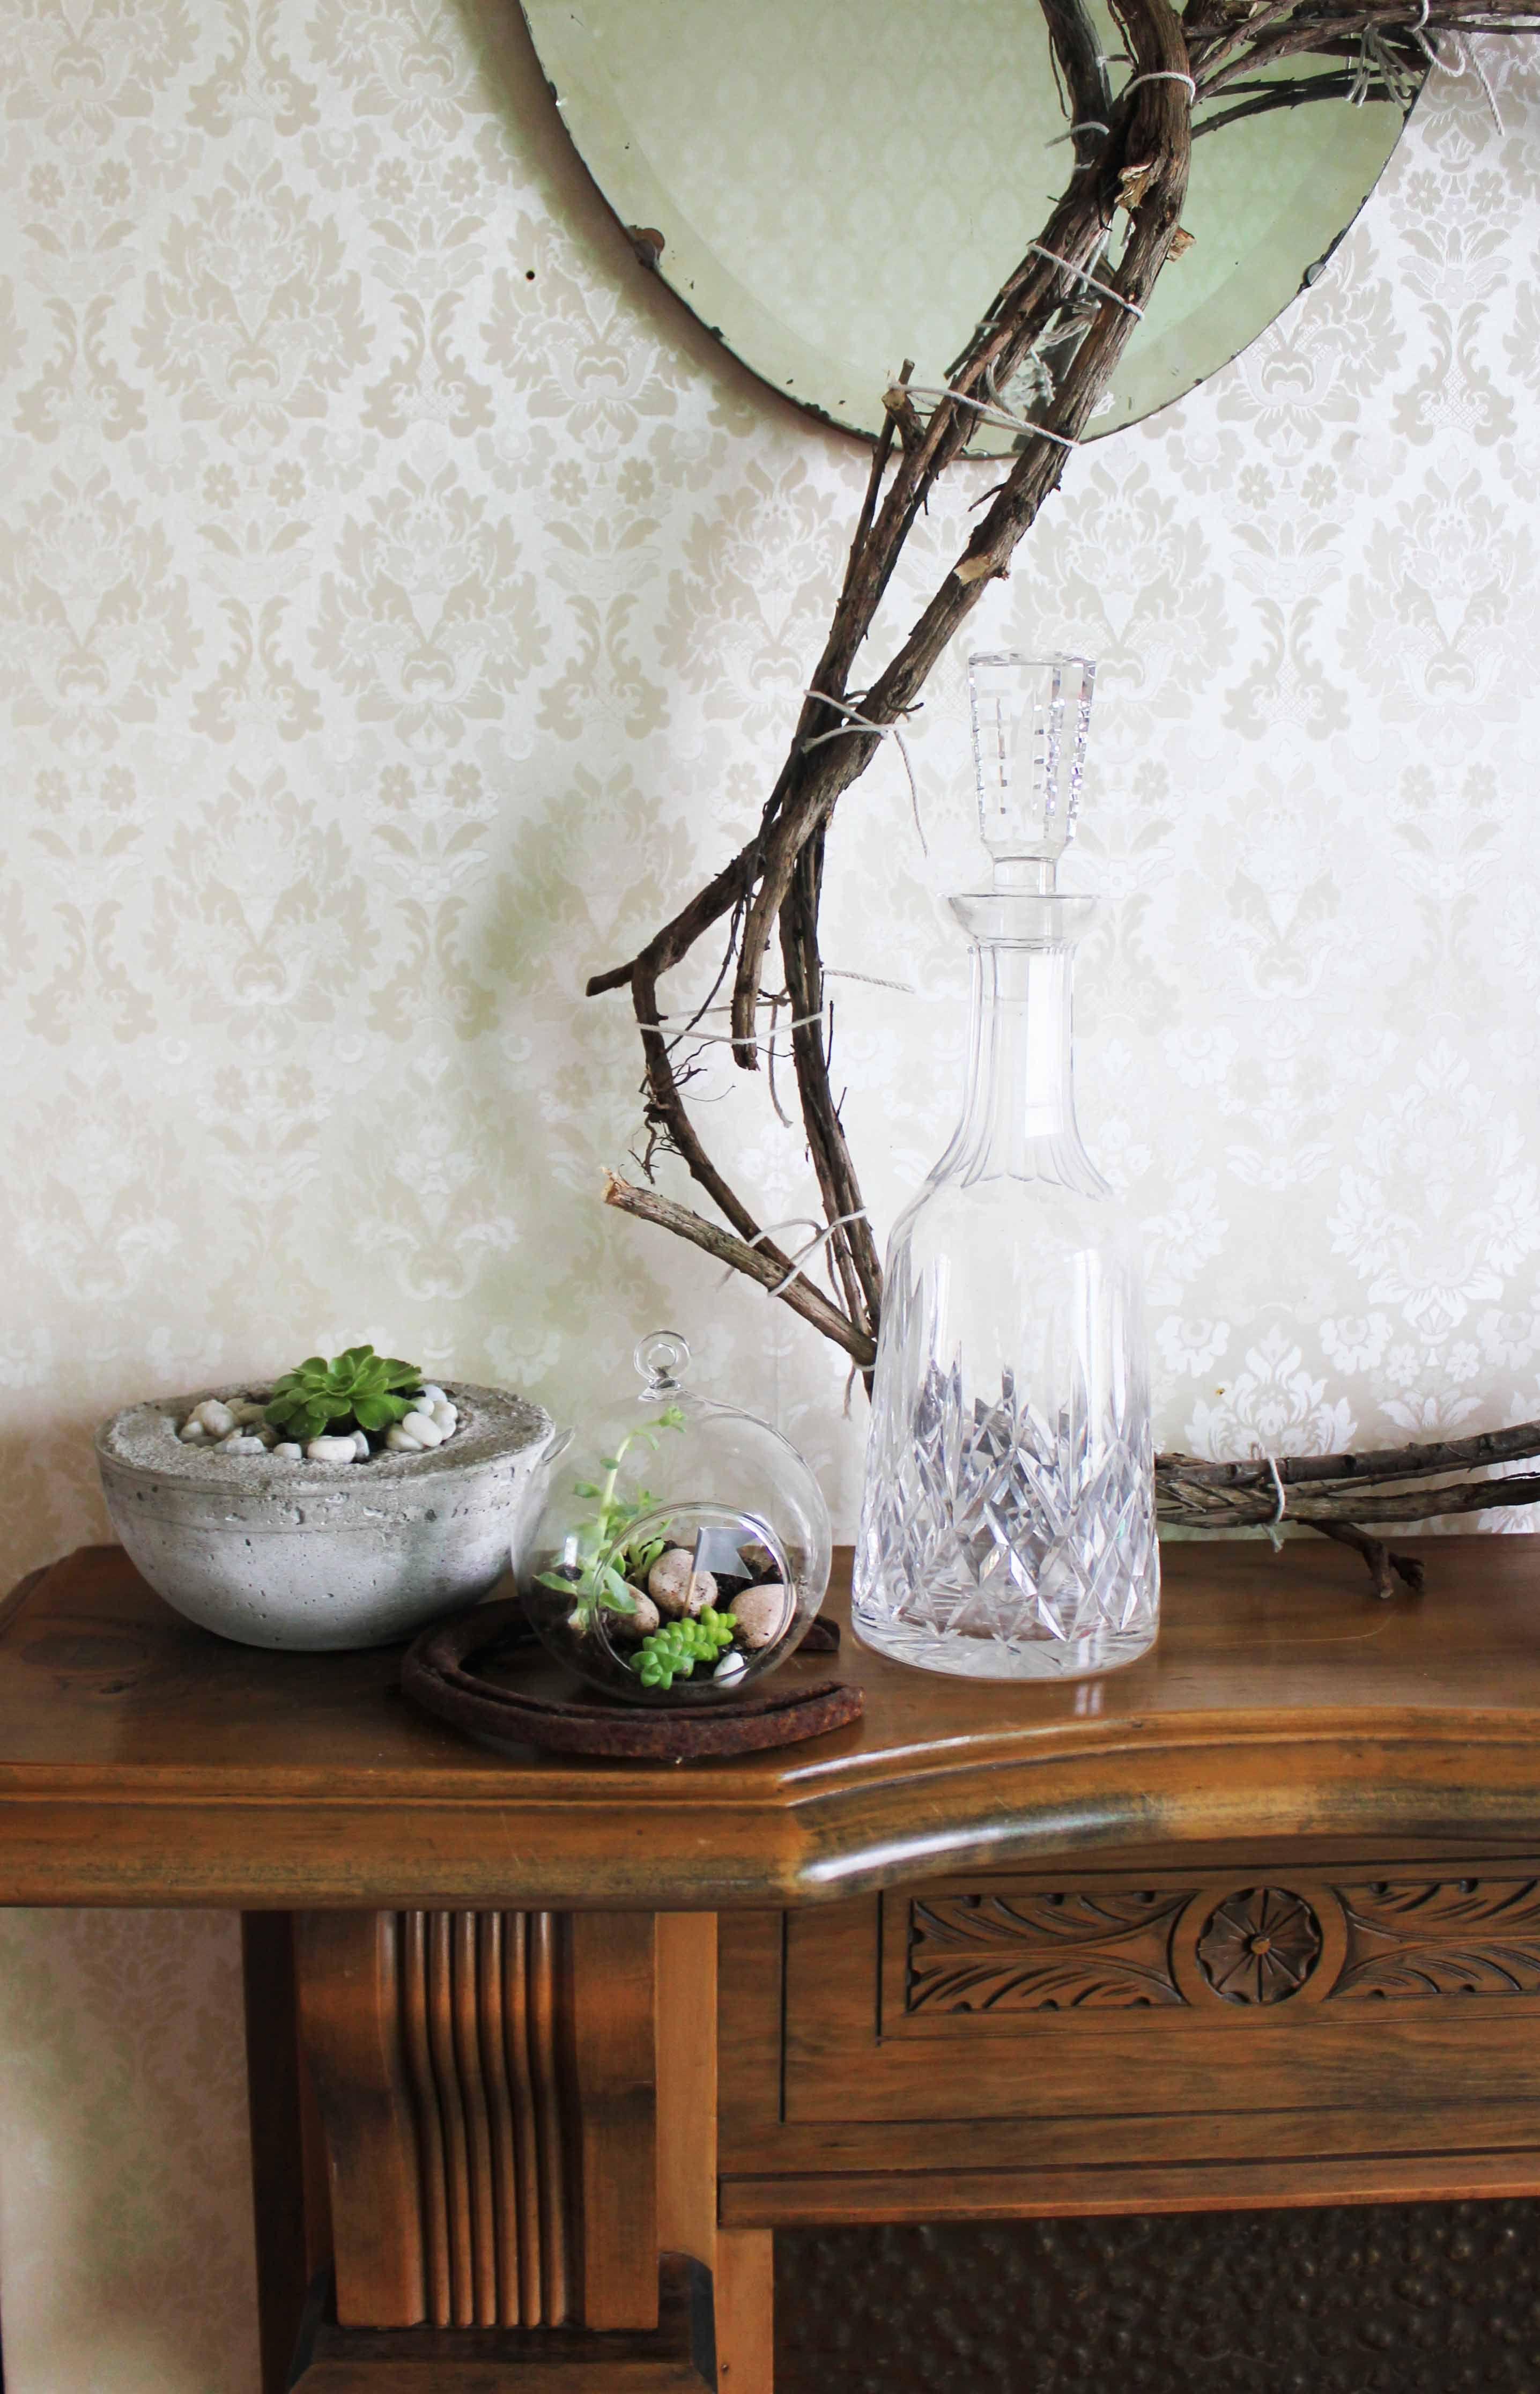 How to make your own terrarium www.diydiva.co.nz/ Vase